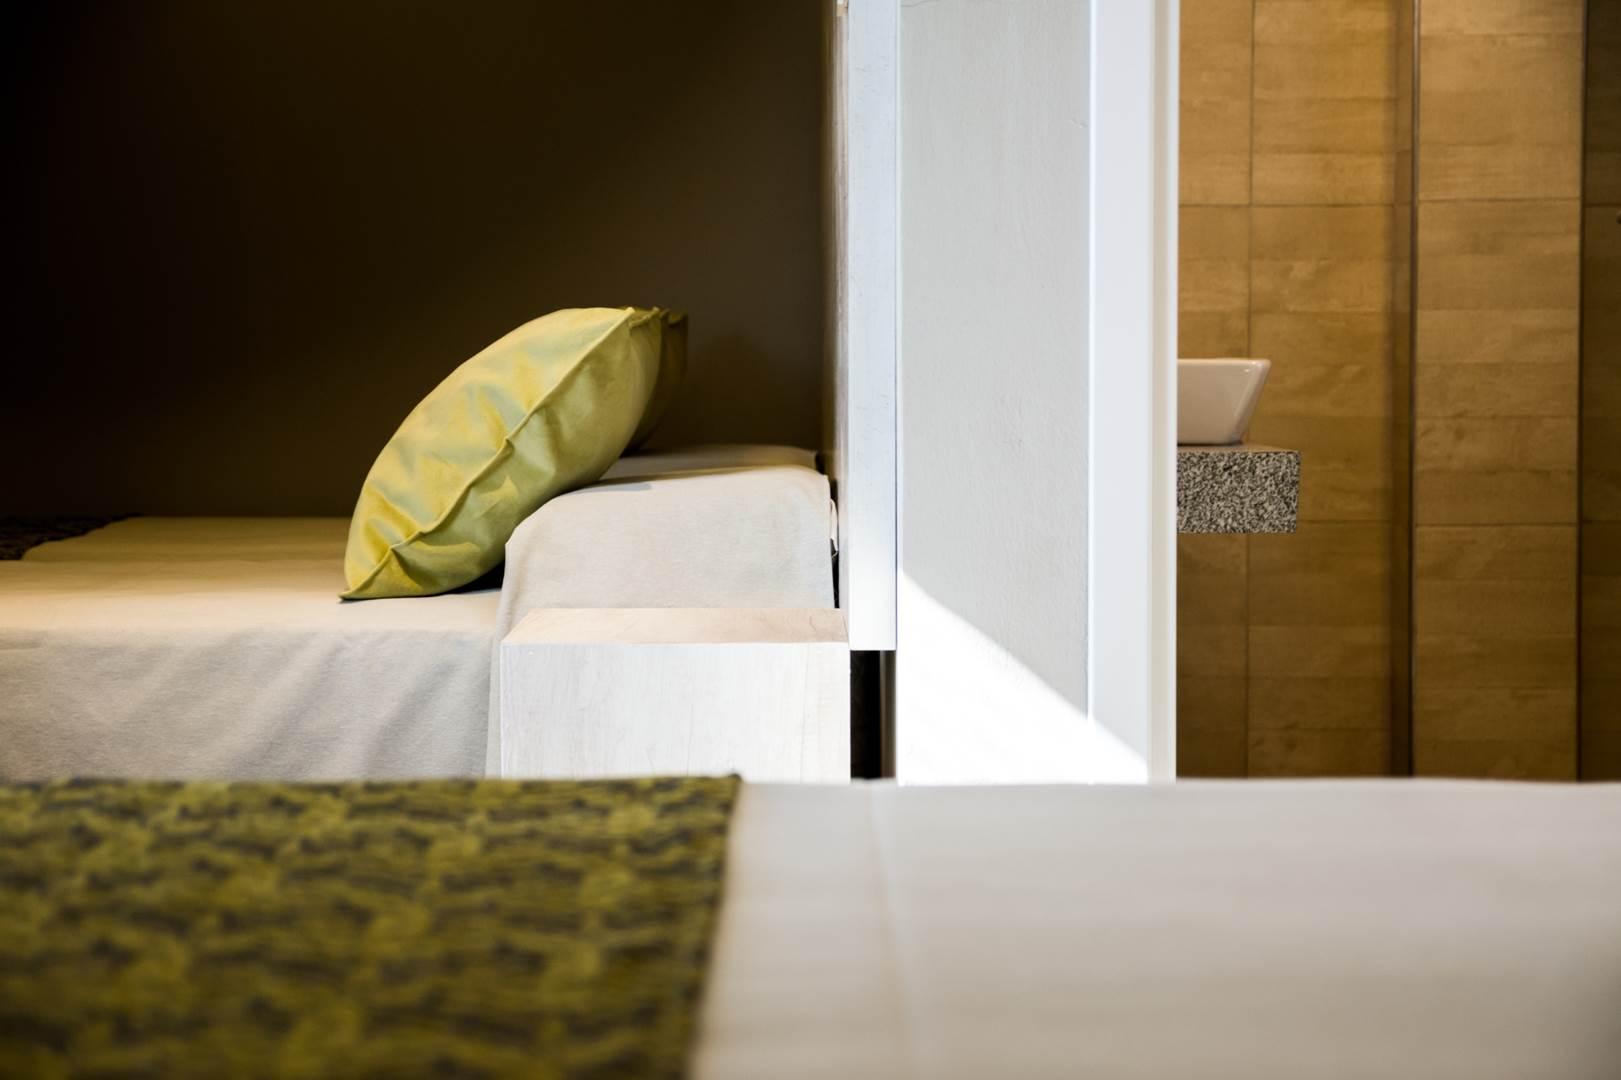 090916  -  HOTEL ALPRE ph G Viramonte-9690 (Copy)